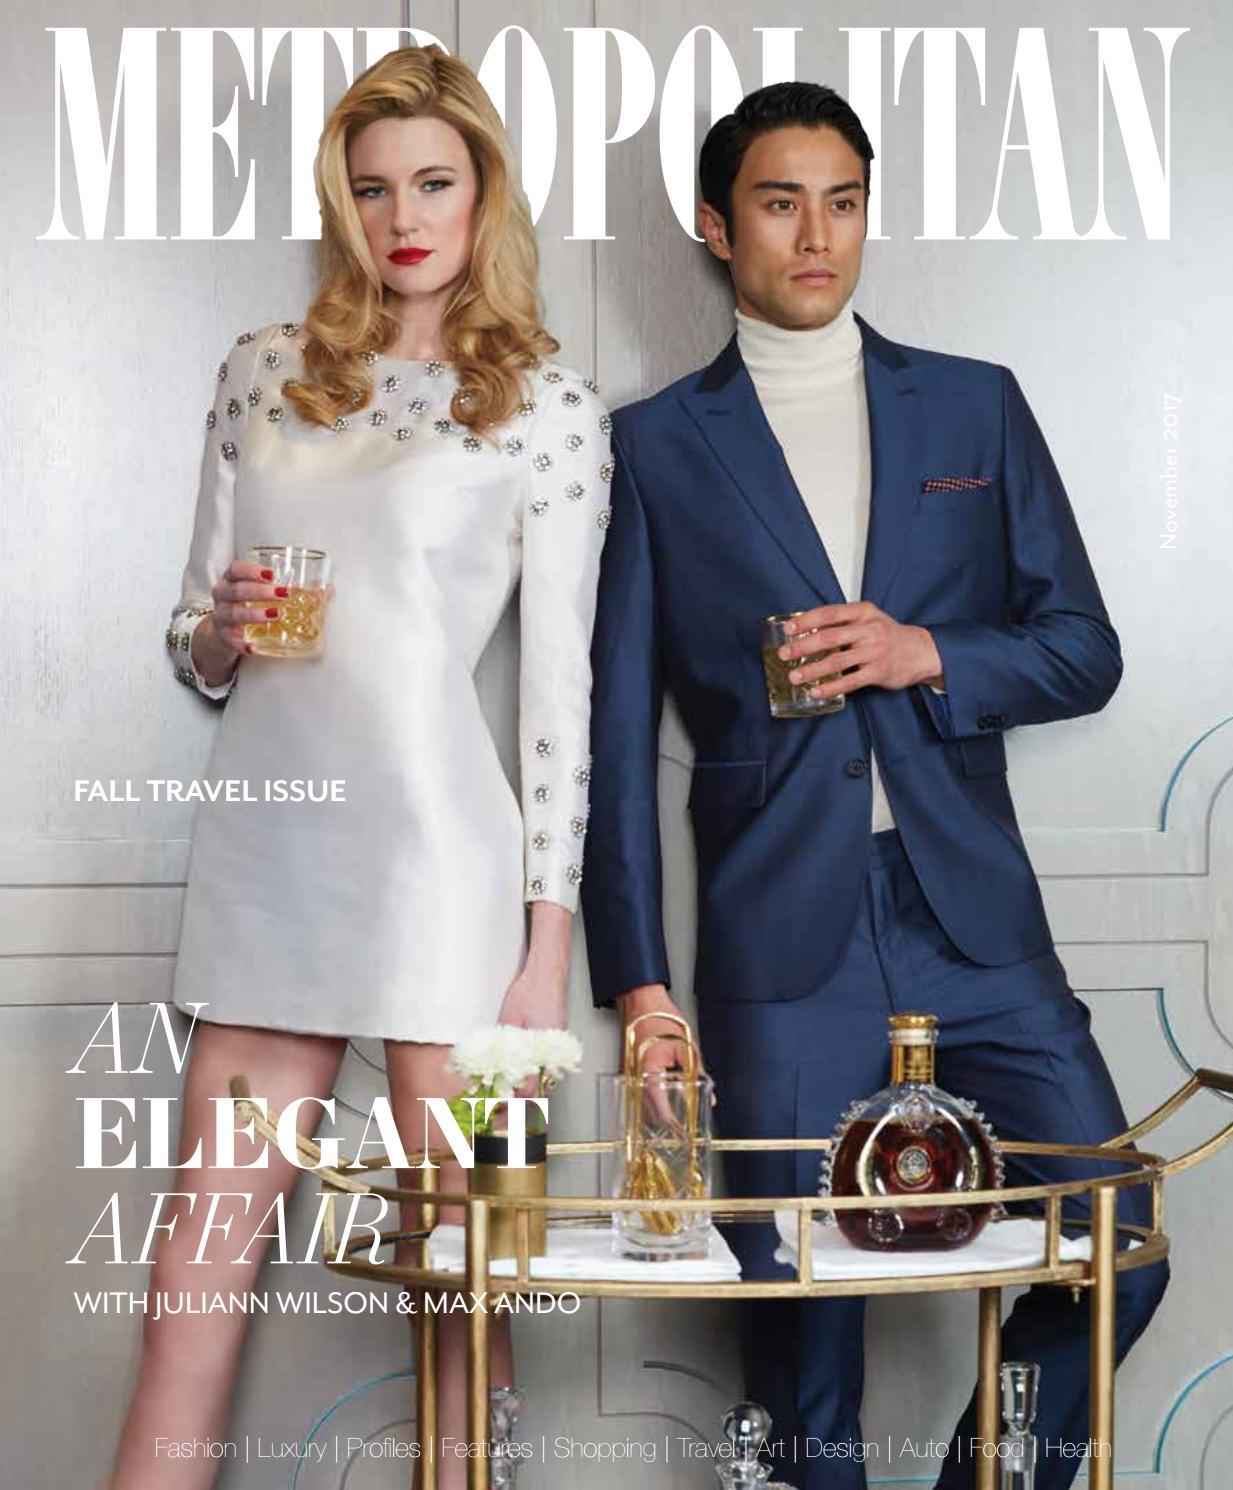 92b4468f976 Metropolitan Magazine November 2017 by Metropolitan Magazine - issuu